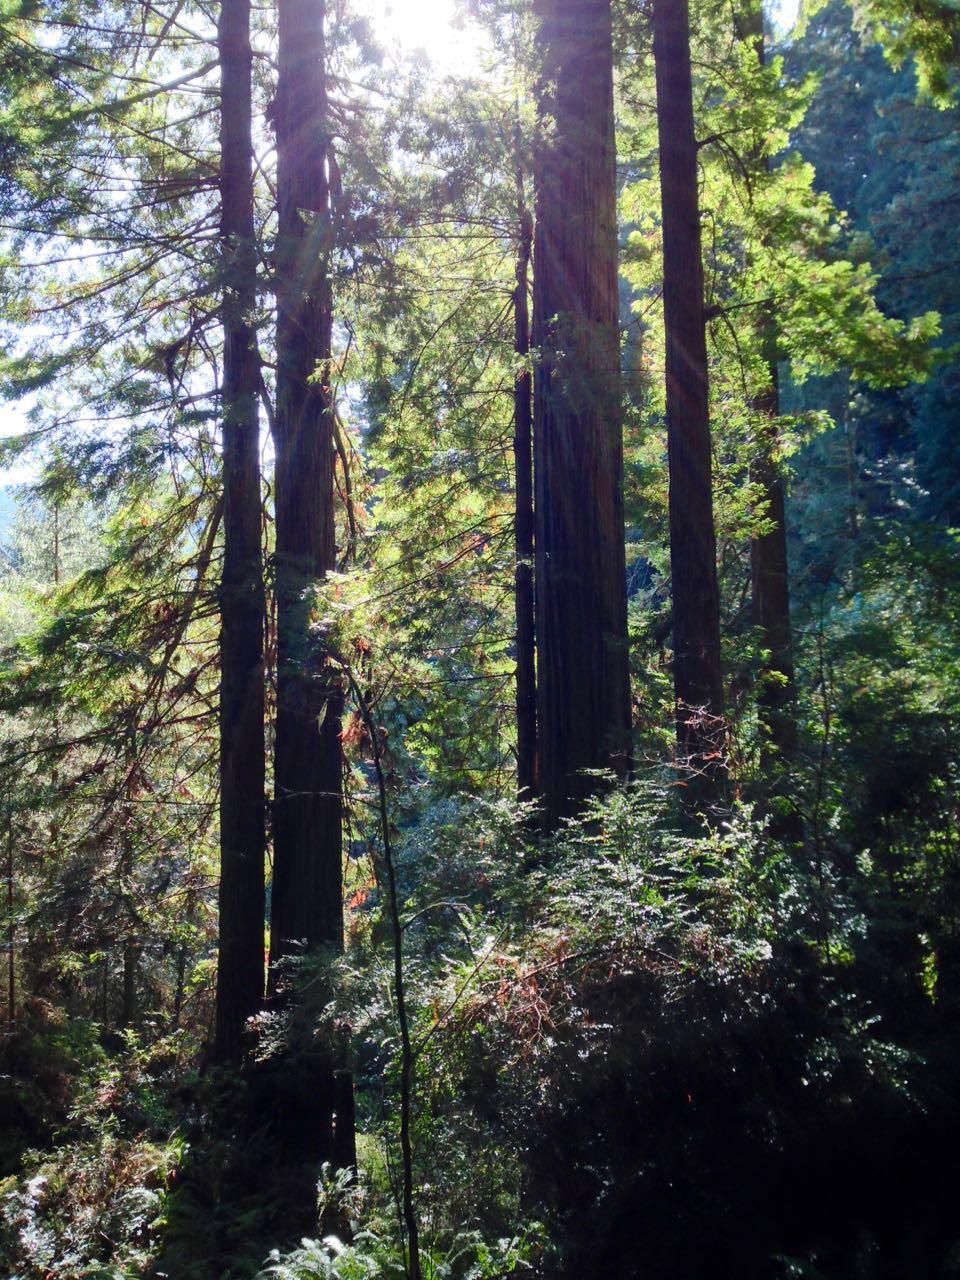 Redwoods 2017 10 08 216 Of 287